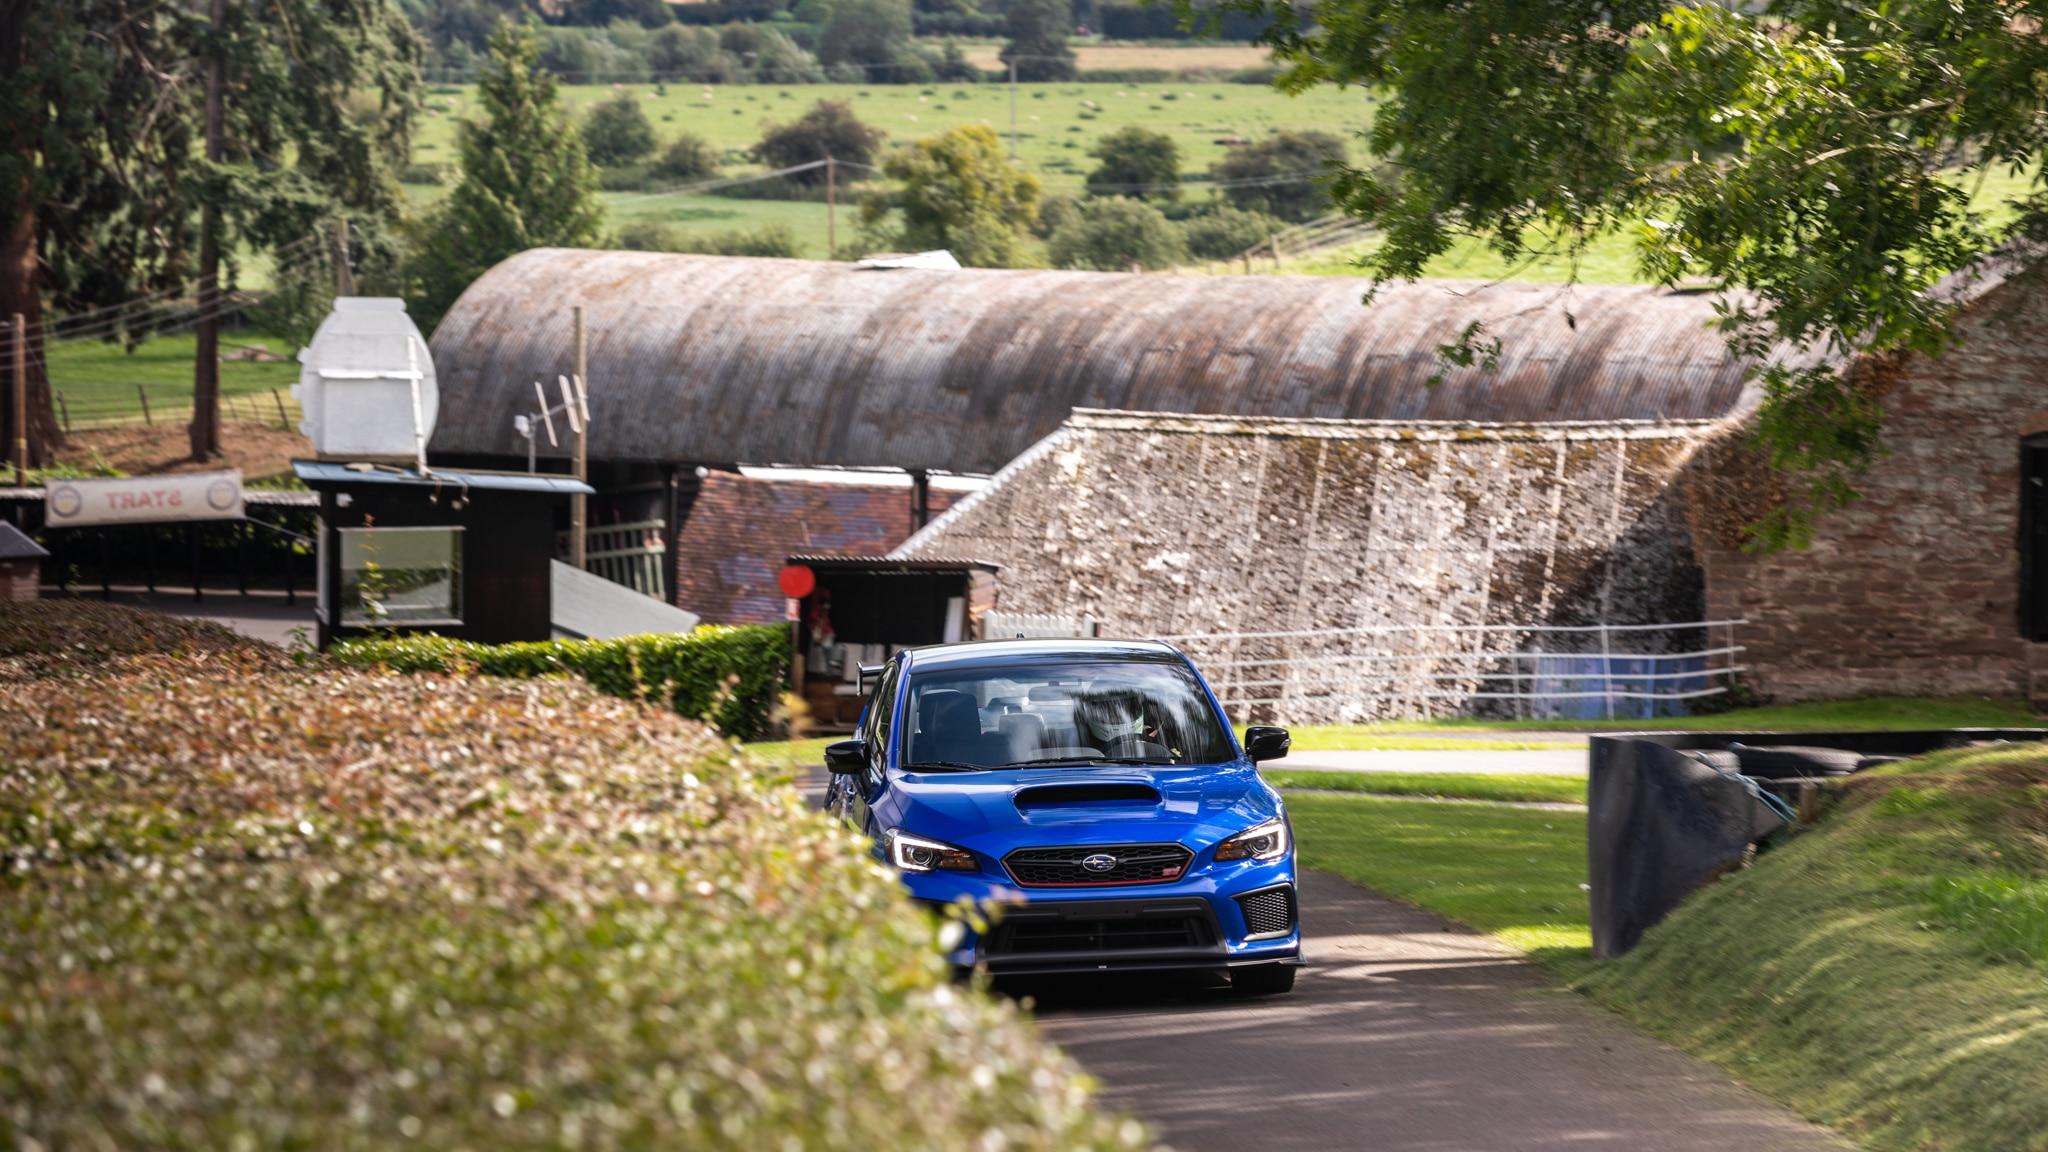 Where Is Subaru From >> Chasing A Prewar Hillclimb Record In A 2019 Subaru Wrx Sti